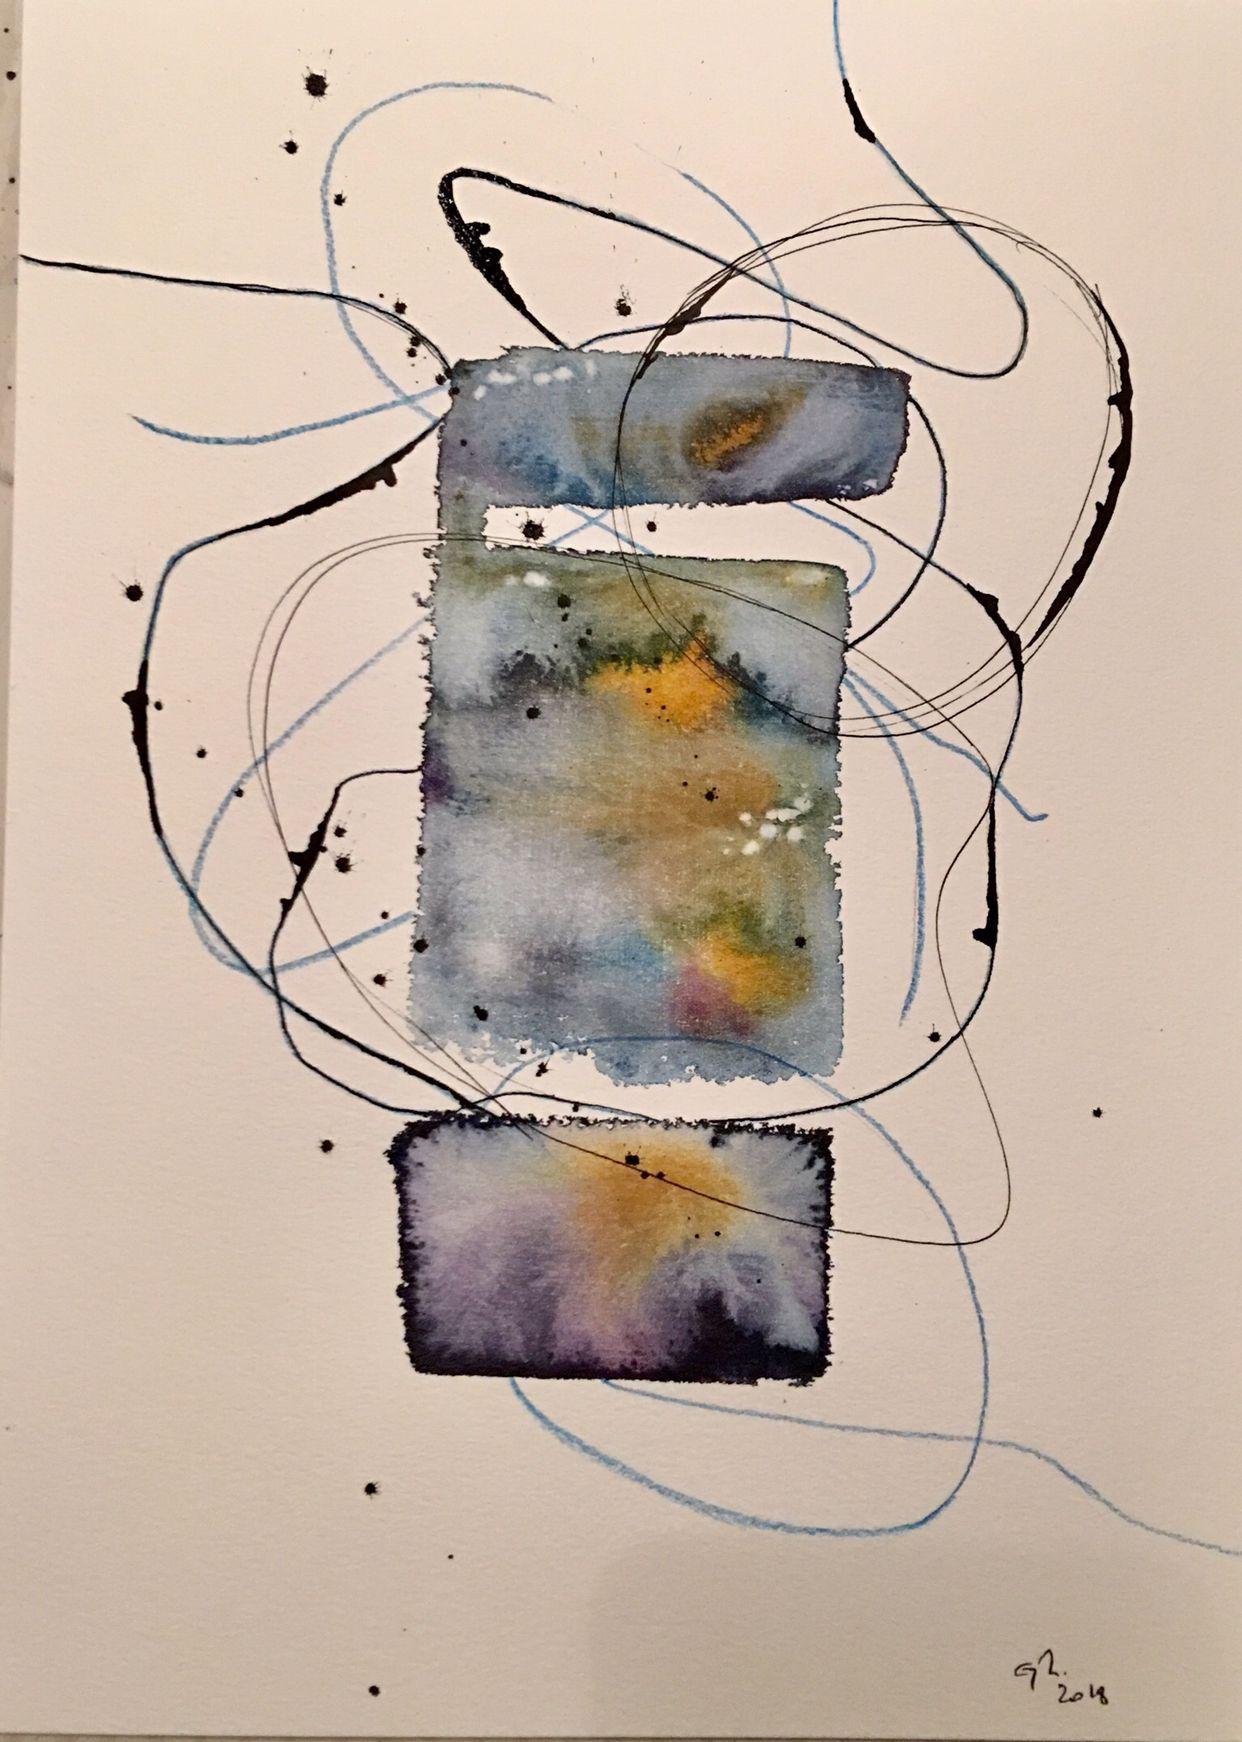 Acrylic Watercolor Ink Mixed Media Painting Abstract Art